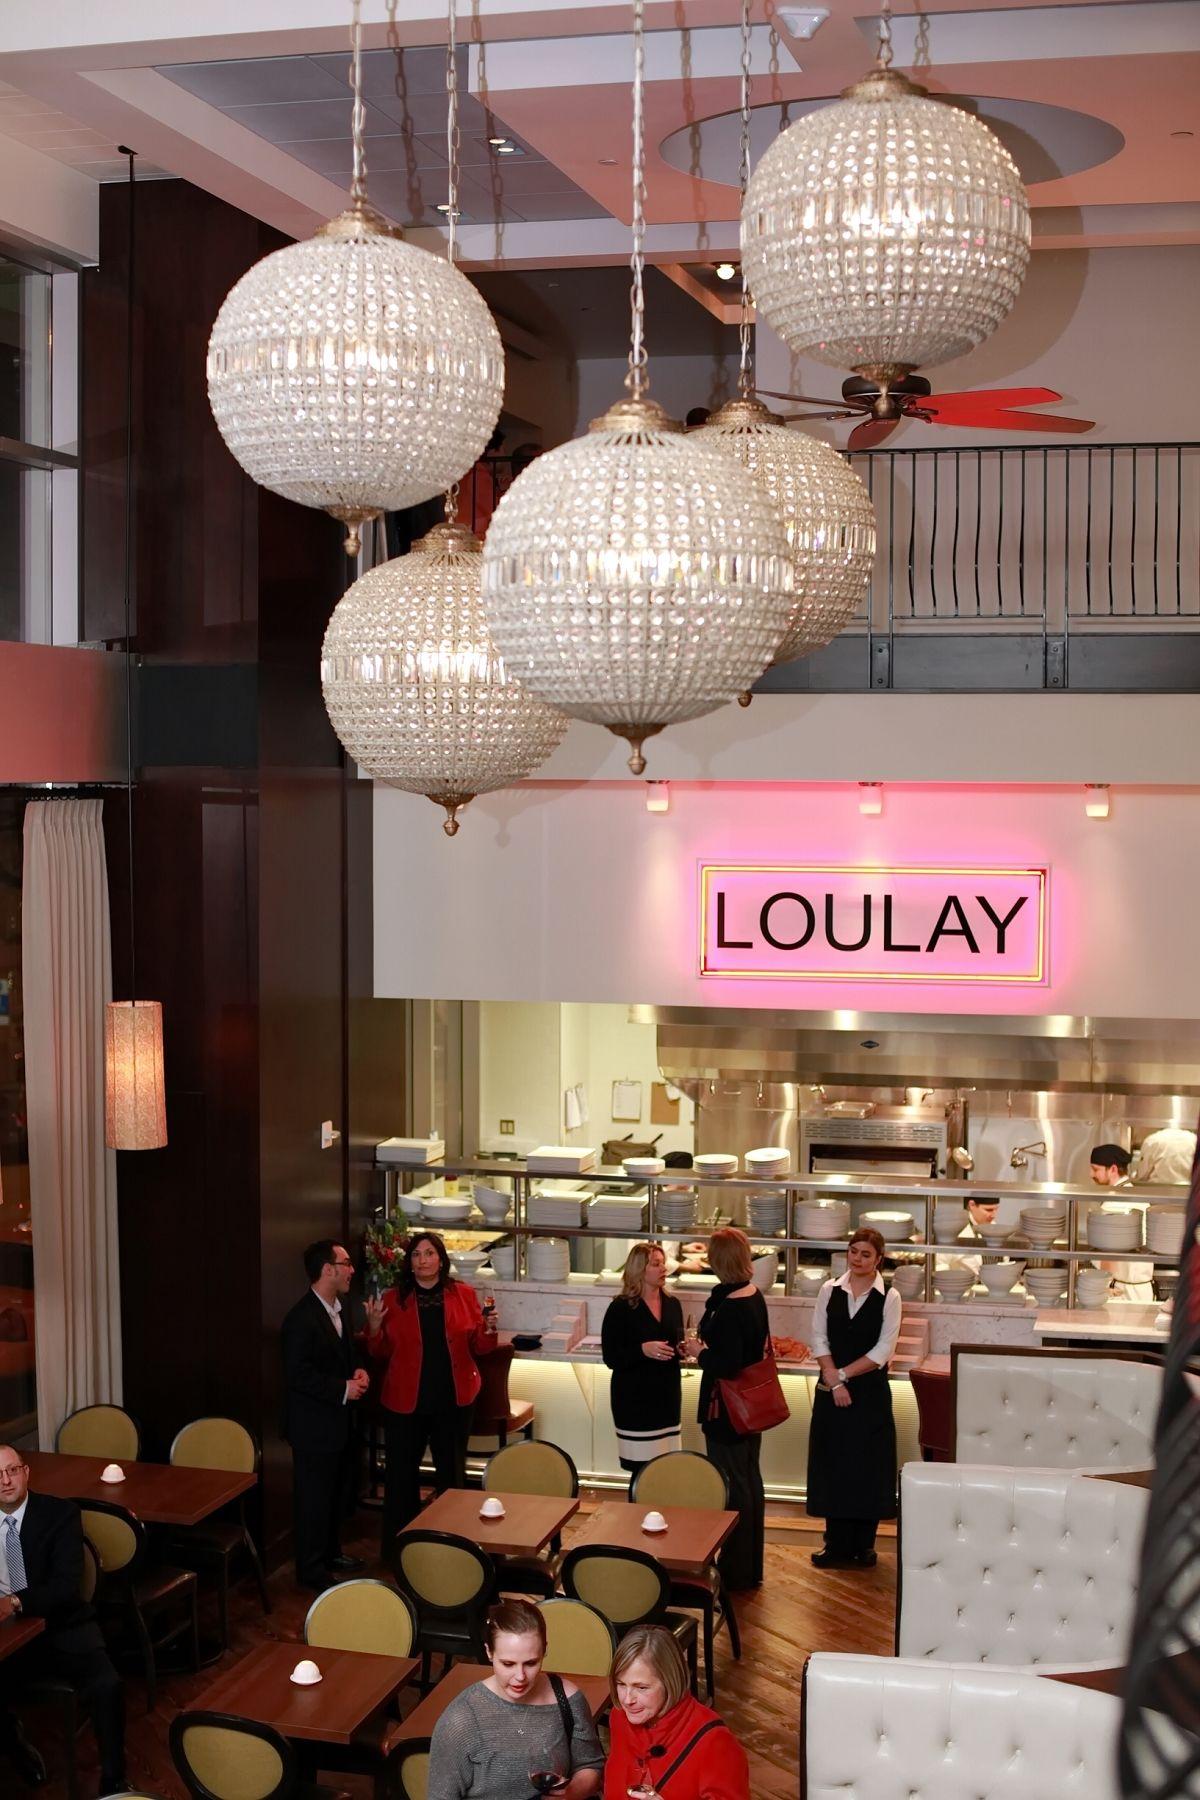 Loulay Kitchen Bar Dining Room Bar Design Restaurant Kitchen Bar Restaurant Design